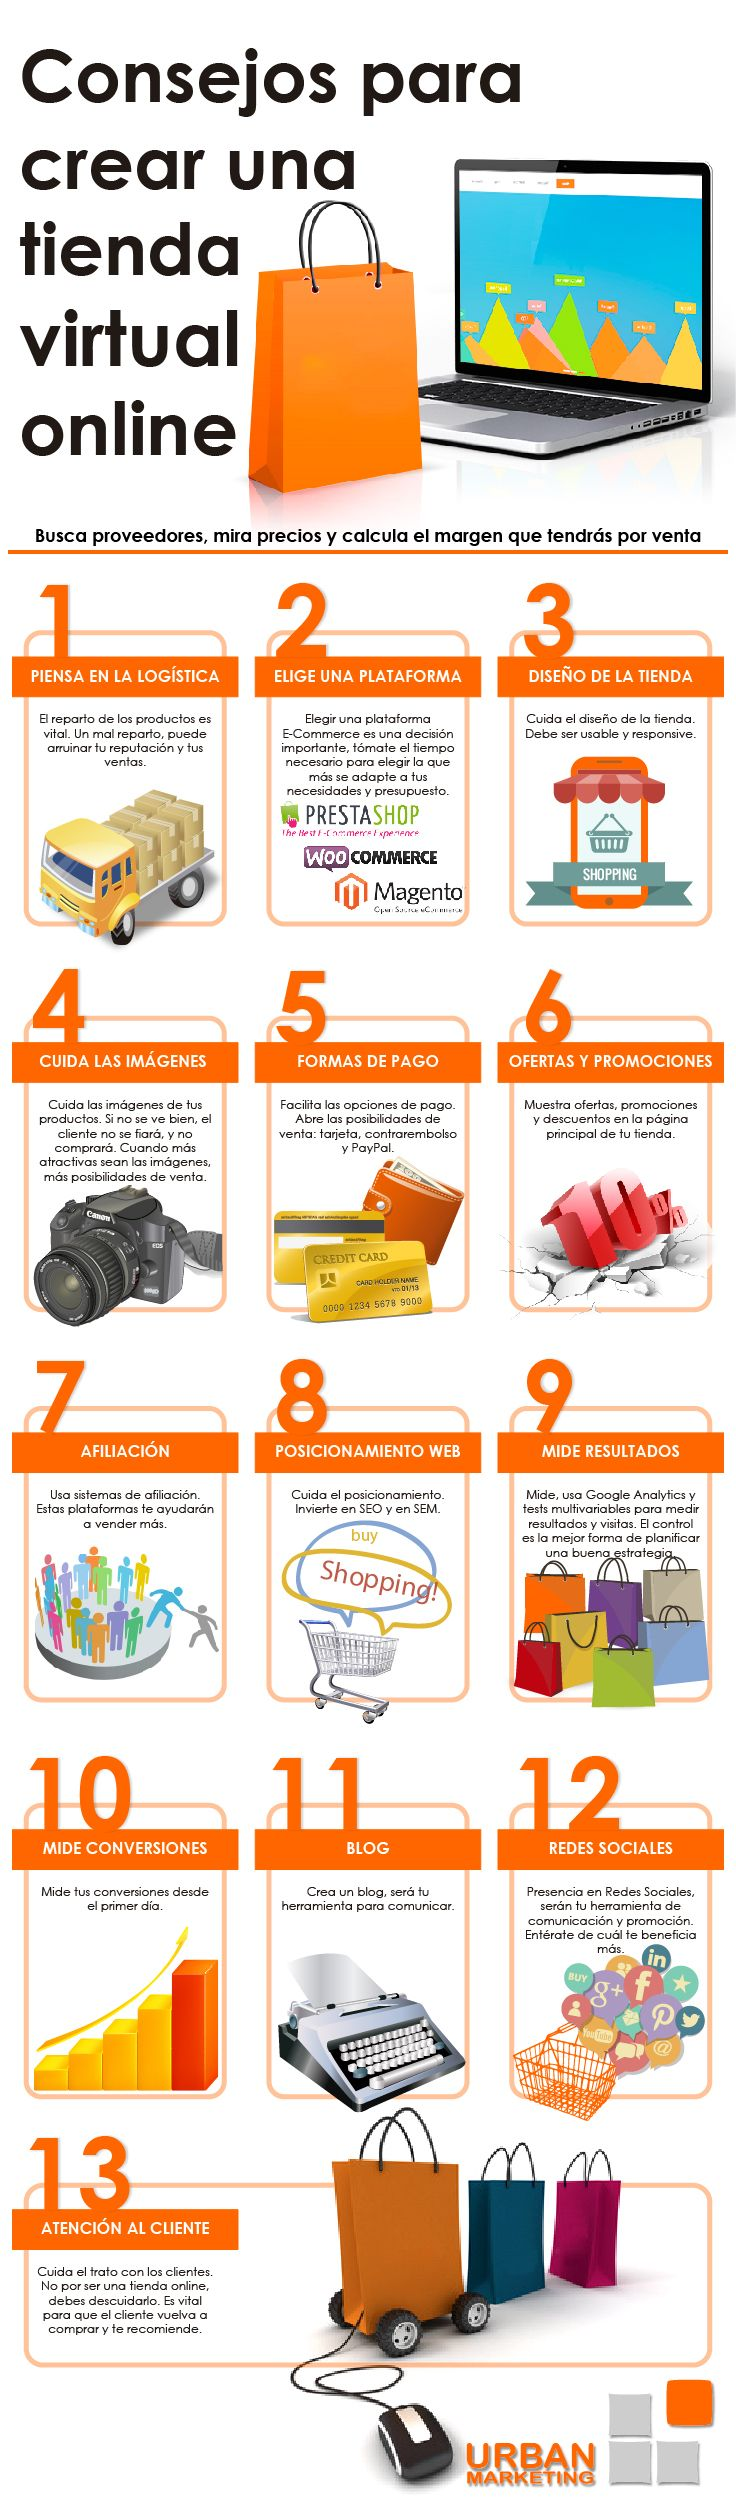 consejos tienda online infografia